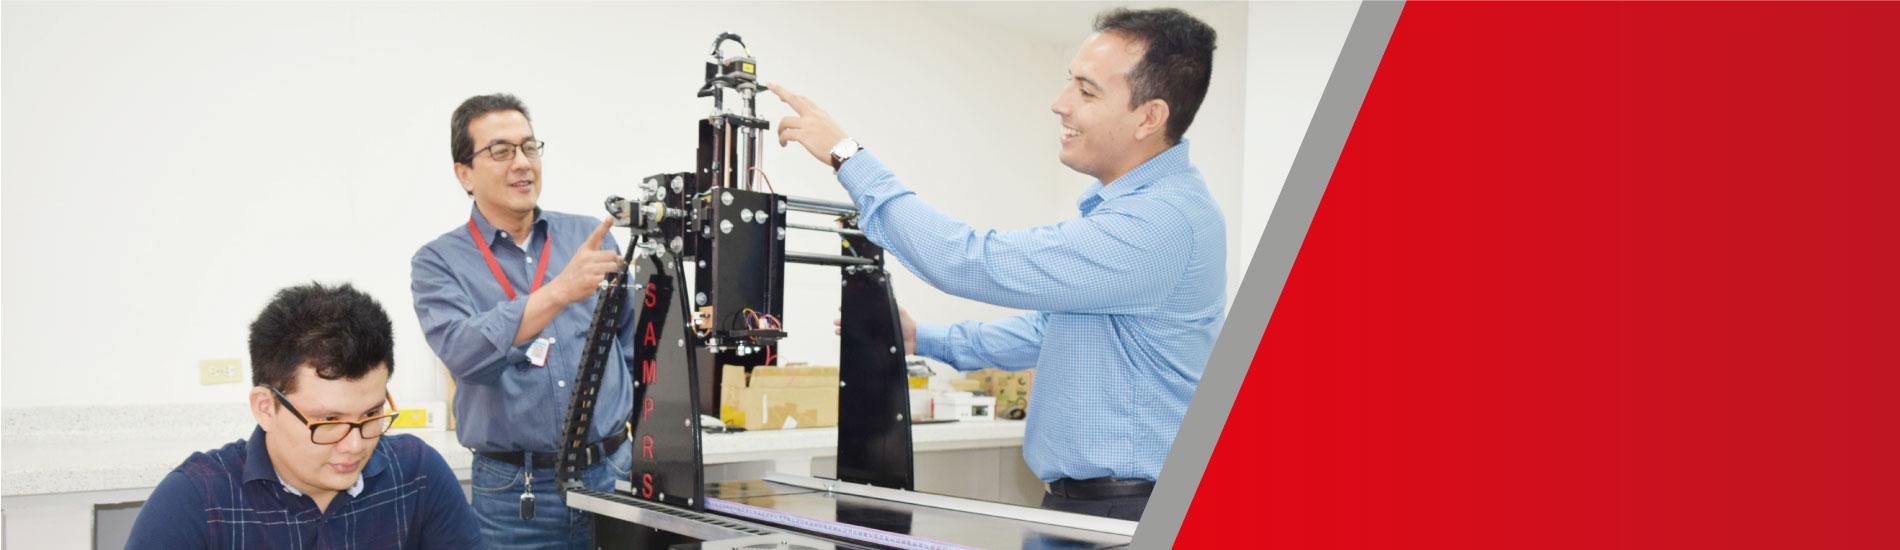 Estudiantes de Ing. Electromecánica crean prototipo con Sistema Automatizado de Medición de Planaridad Superficial